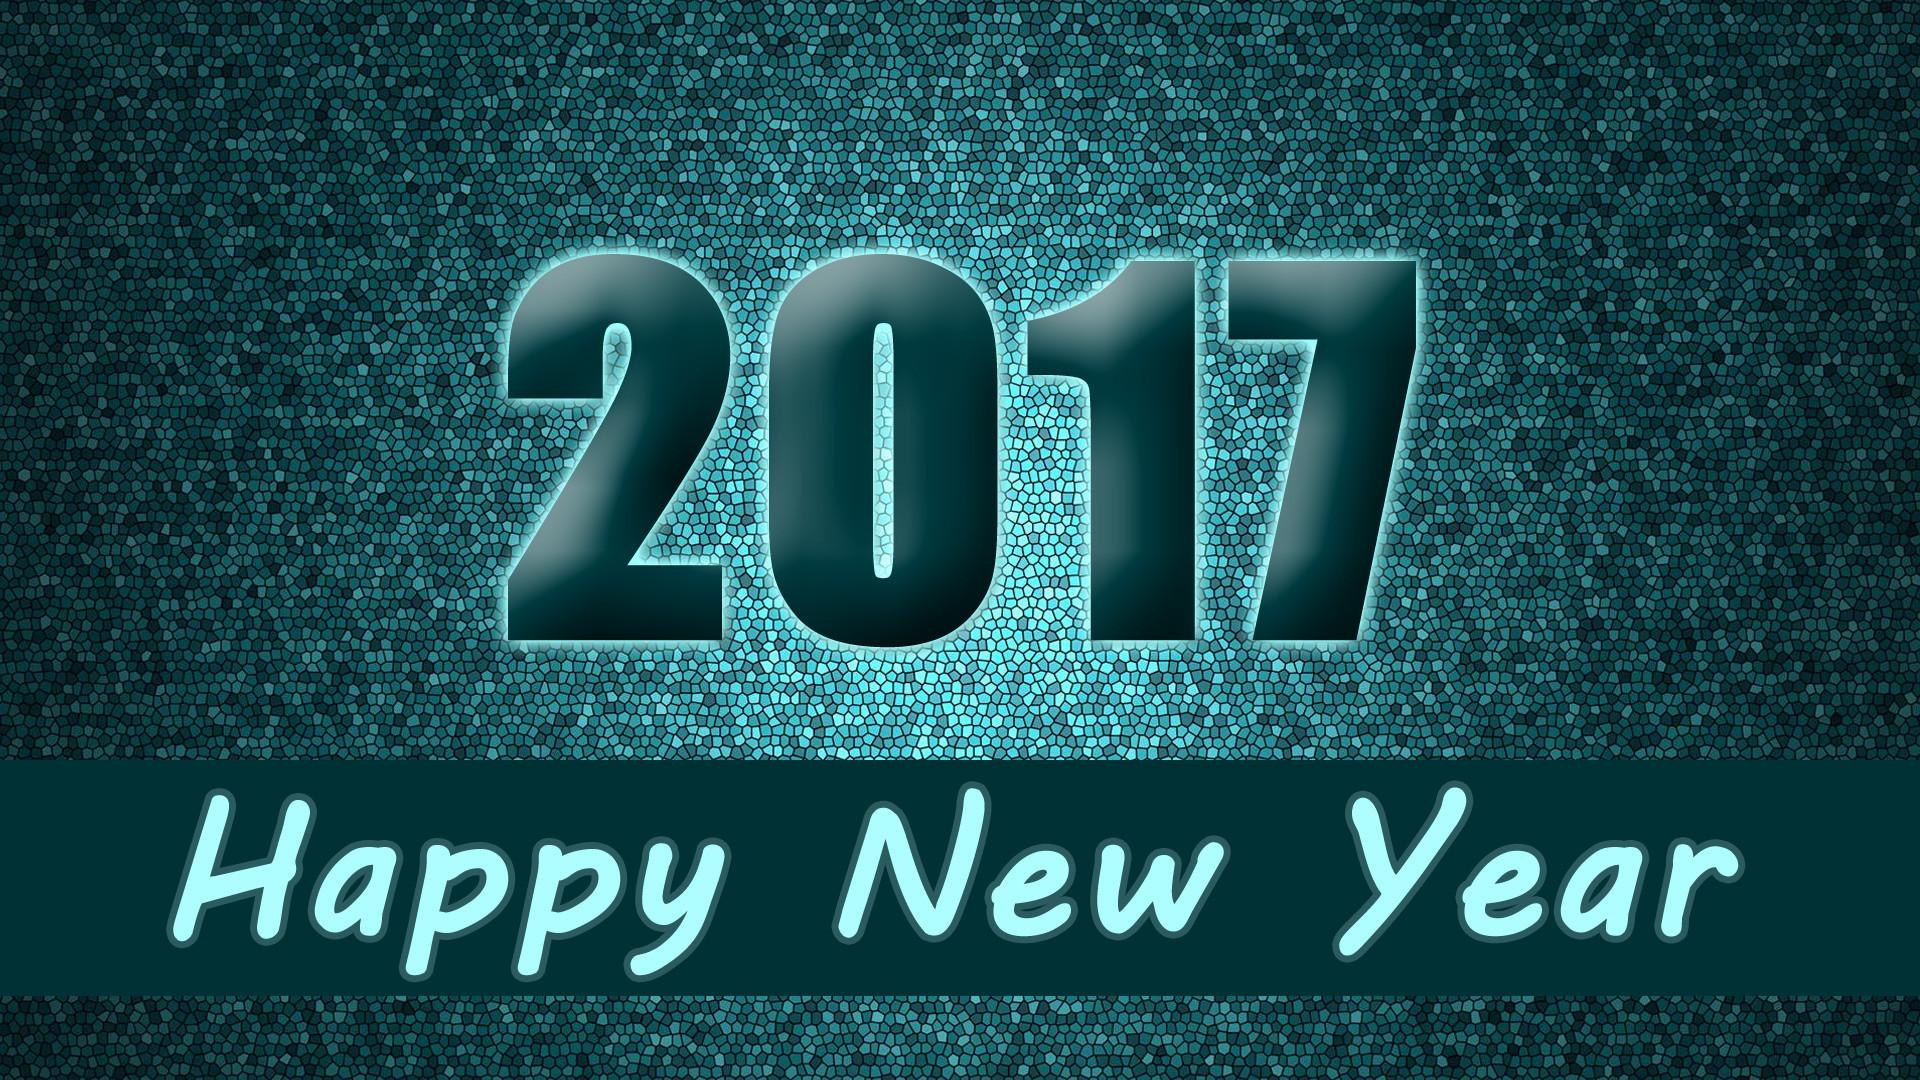 happy-new-year-2017-wallpaper-hd-download